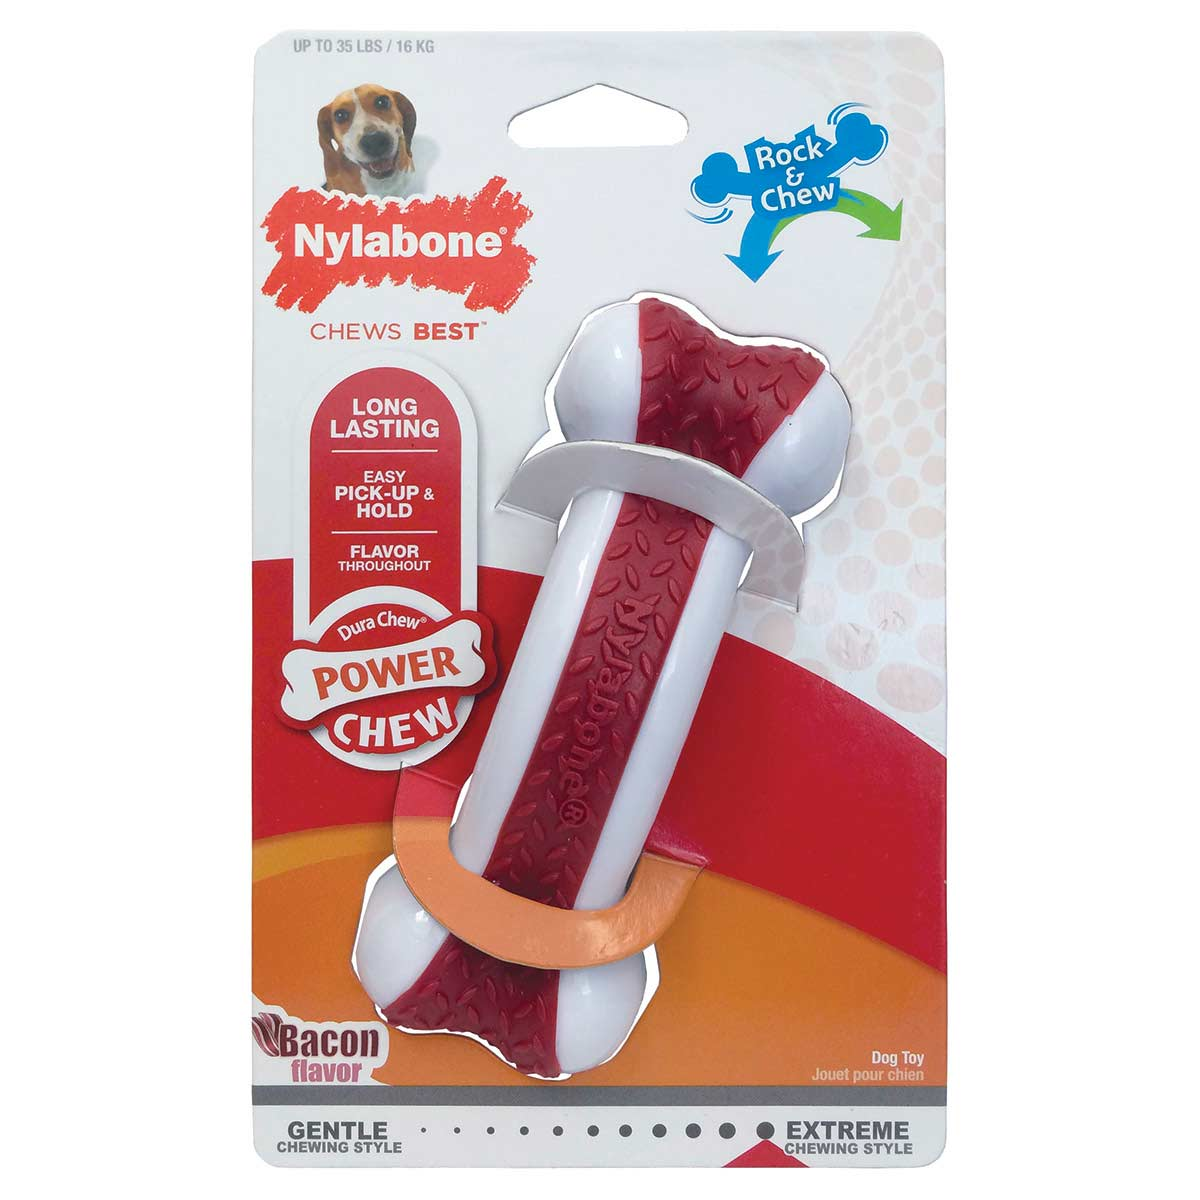 Nylabone Dura Chew Arch Bone and Chew Bacon Flavor Wolf Size Dog Chew